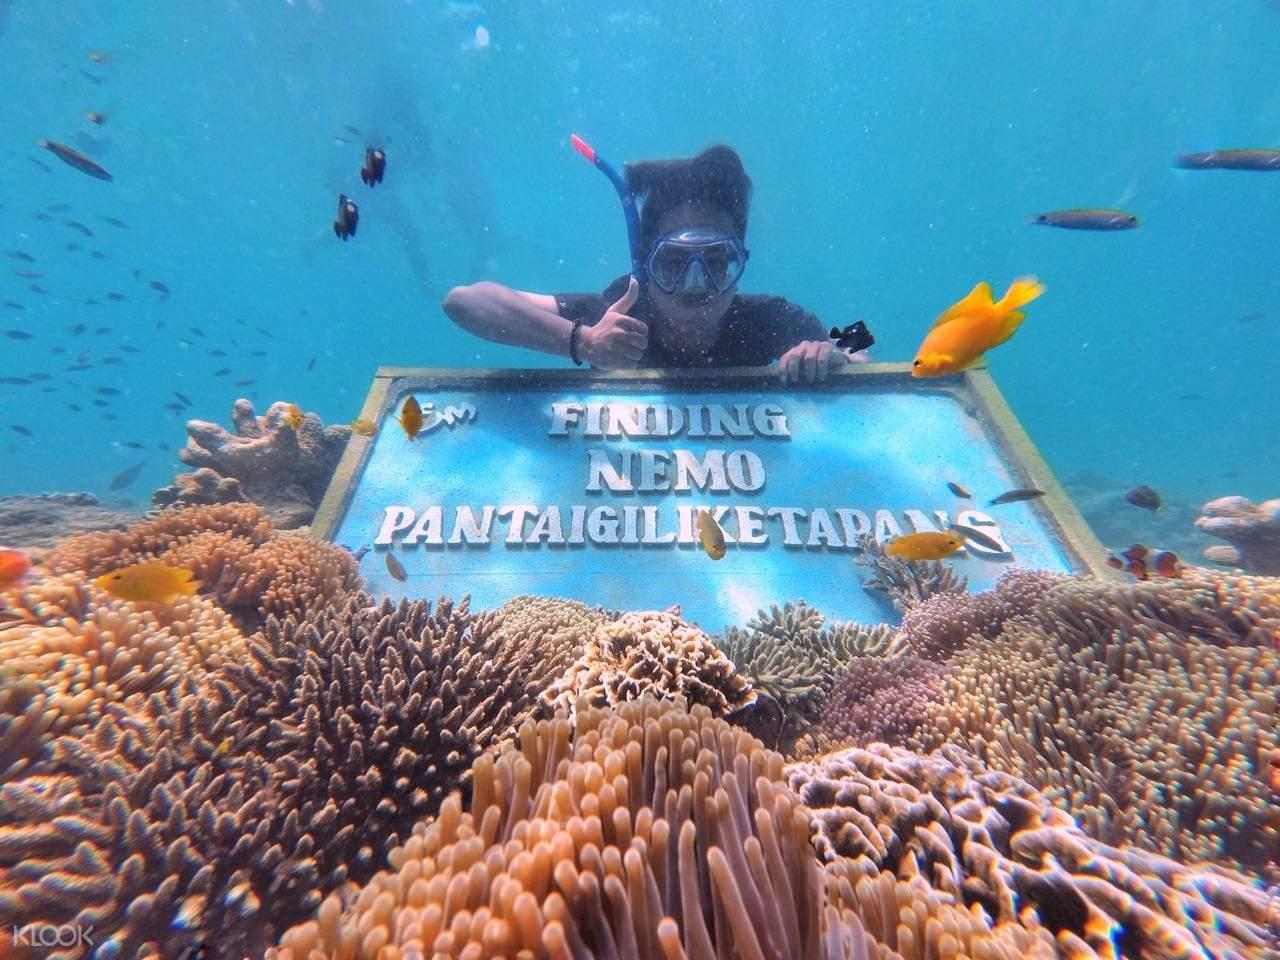 wisatawan berpose di lokasi snorkeling finding nemo